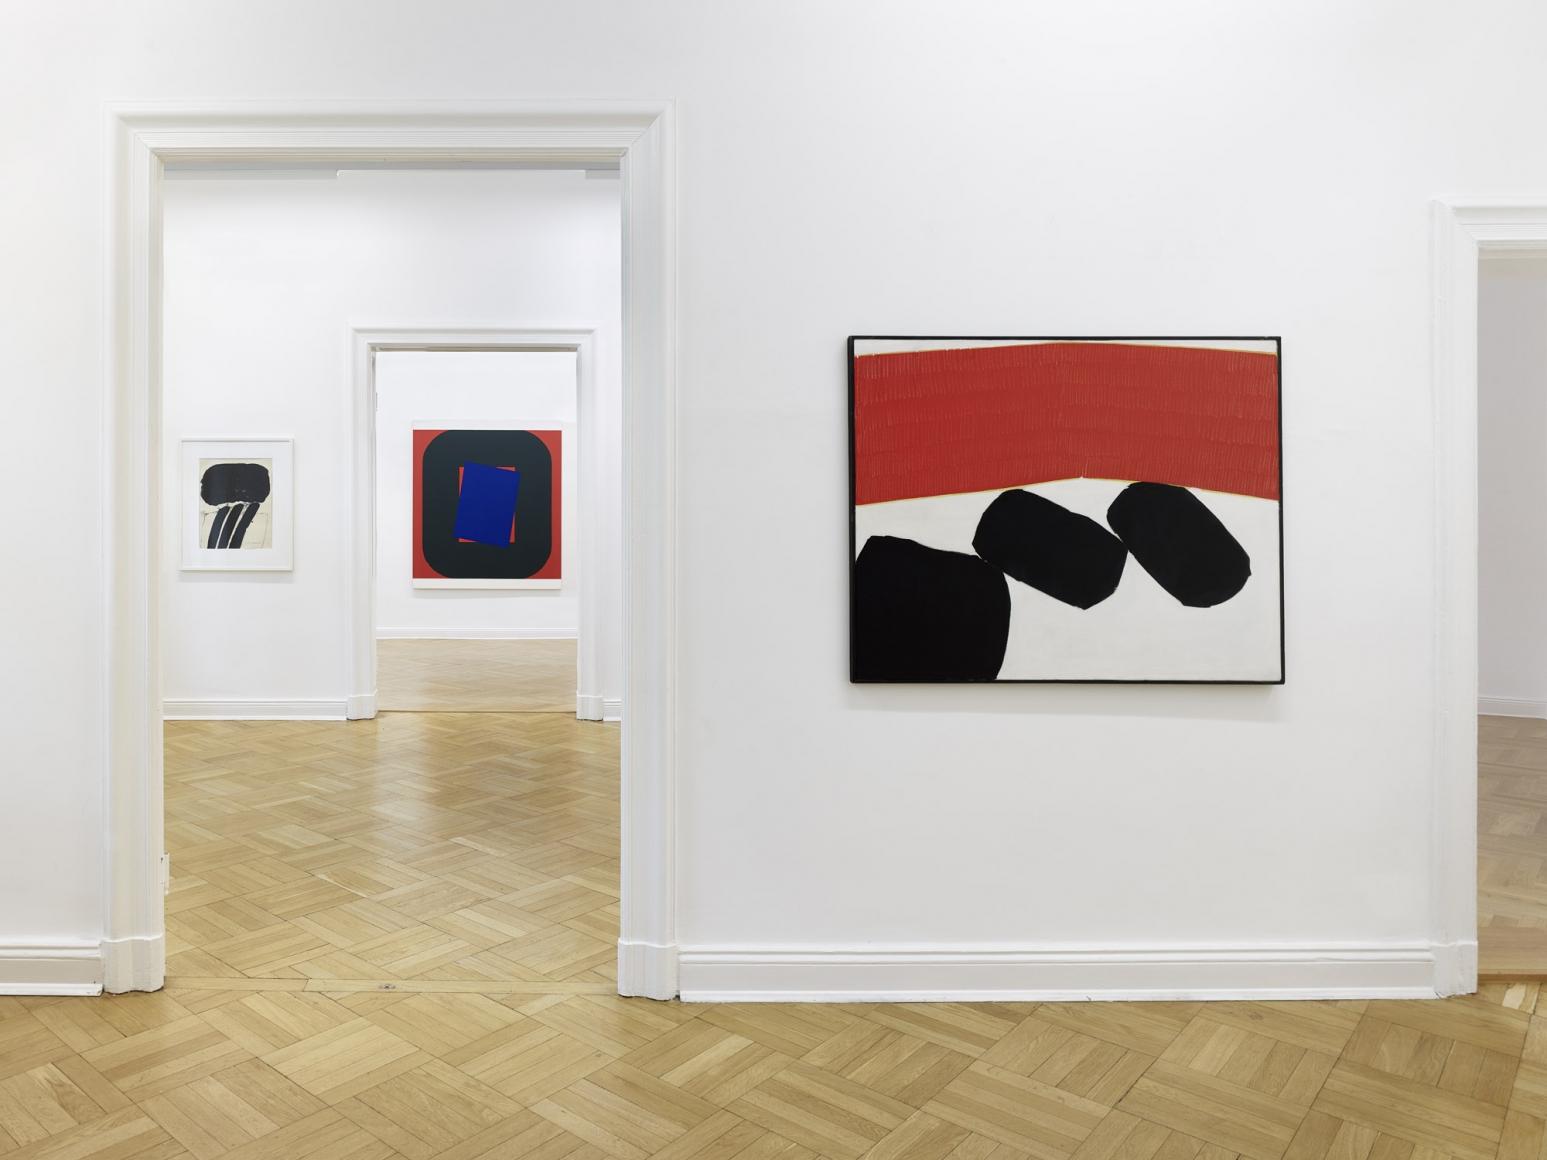 Galerie Friese